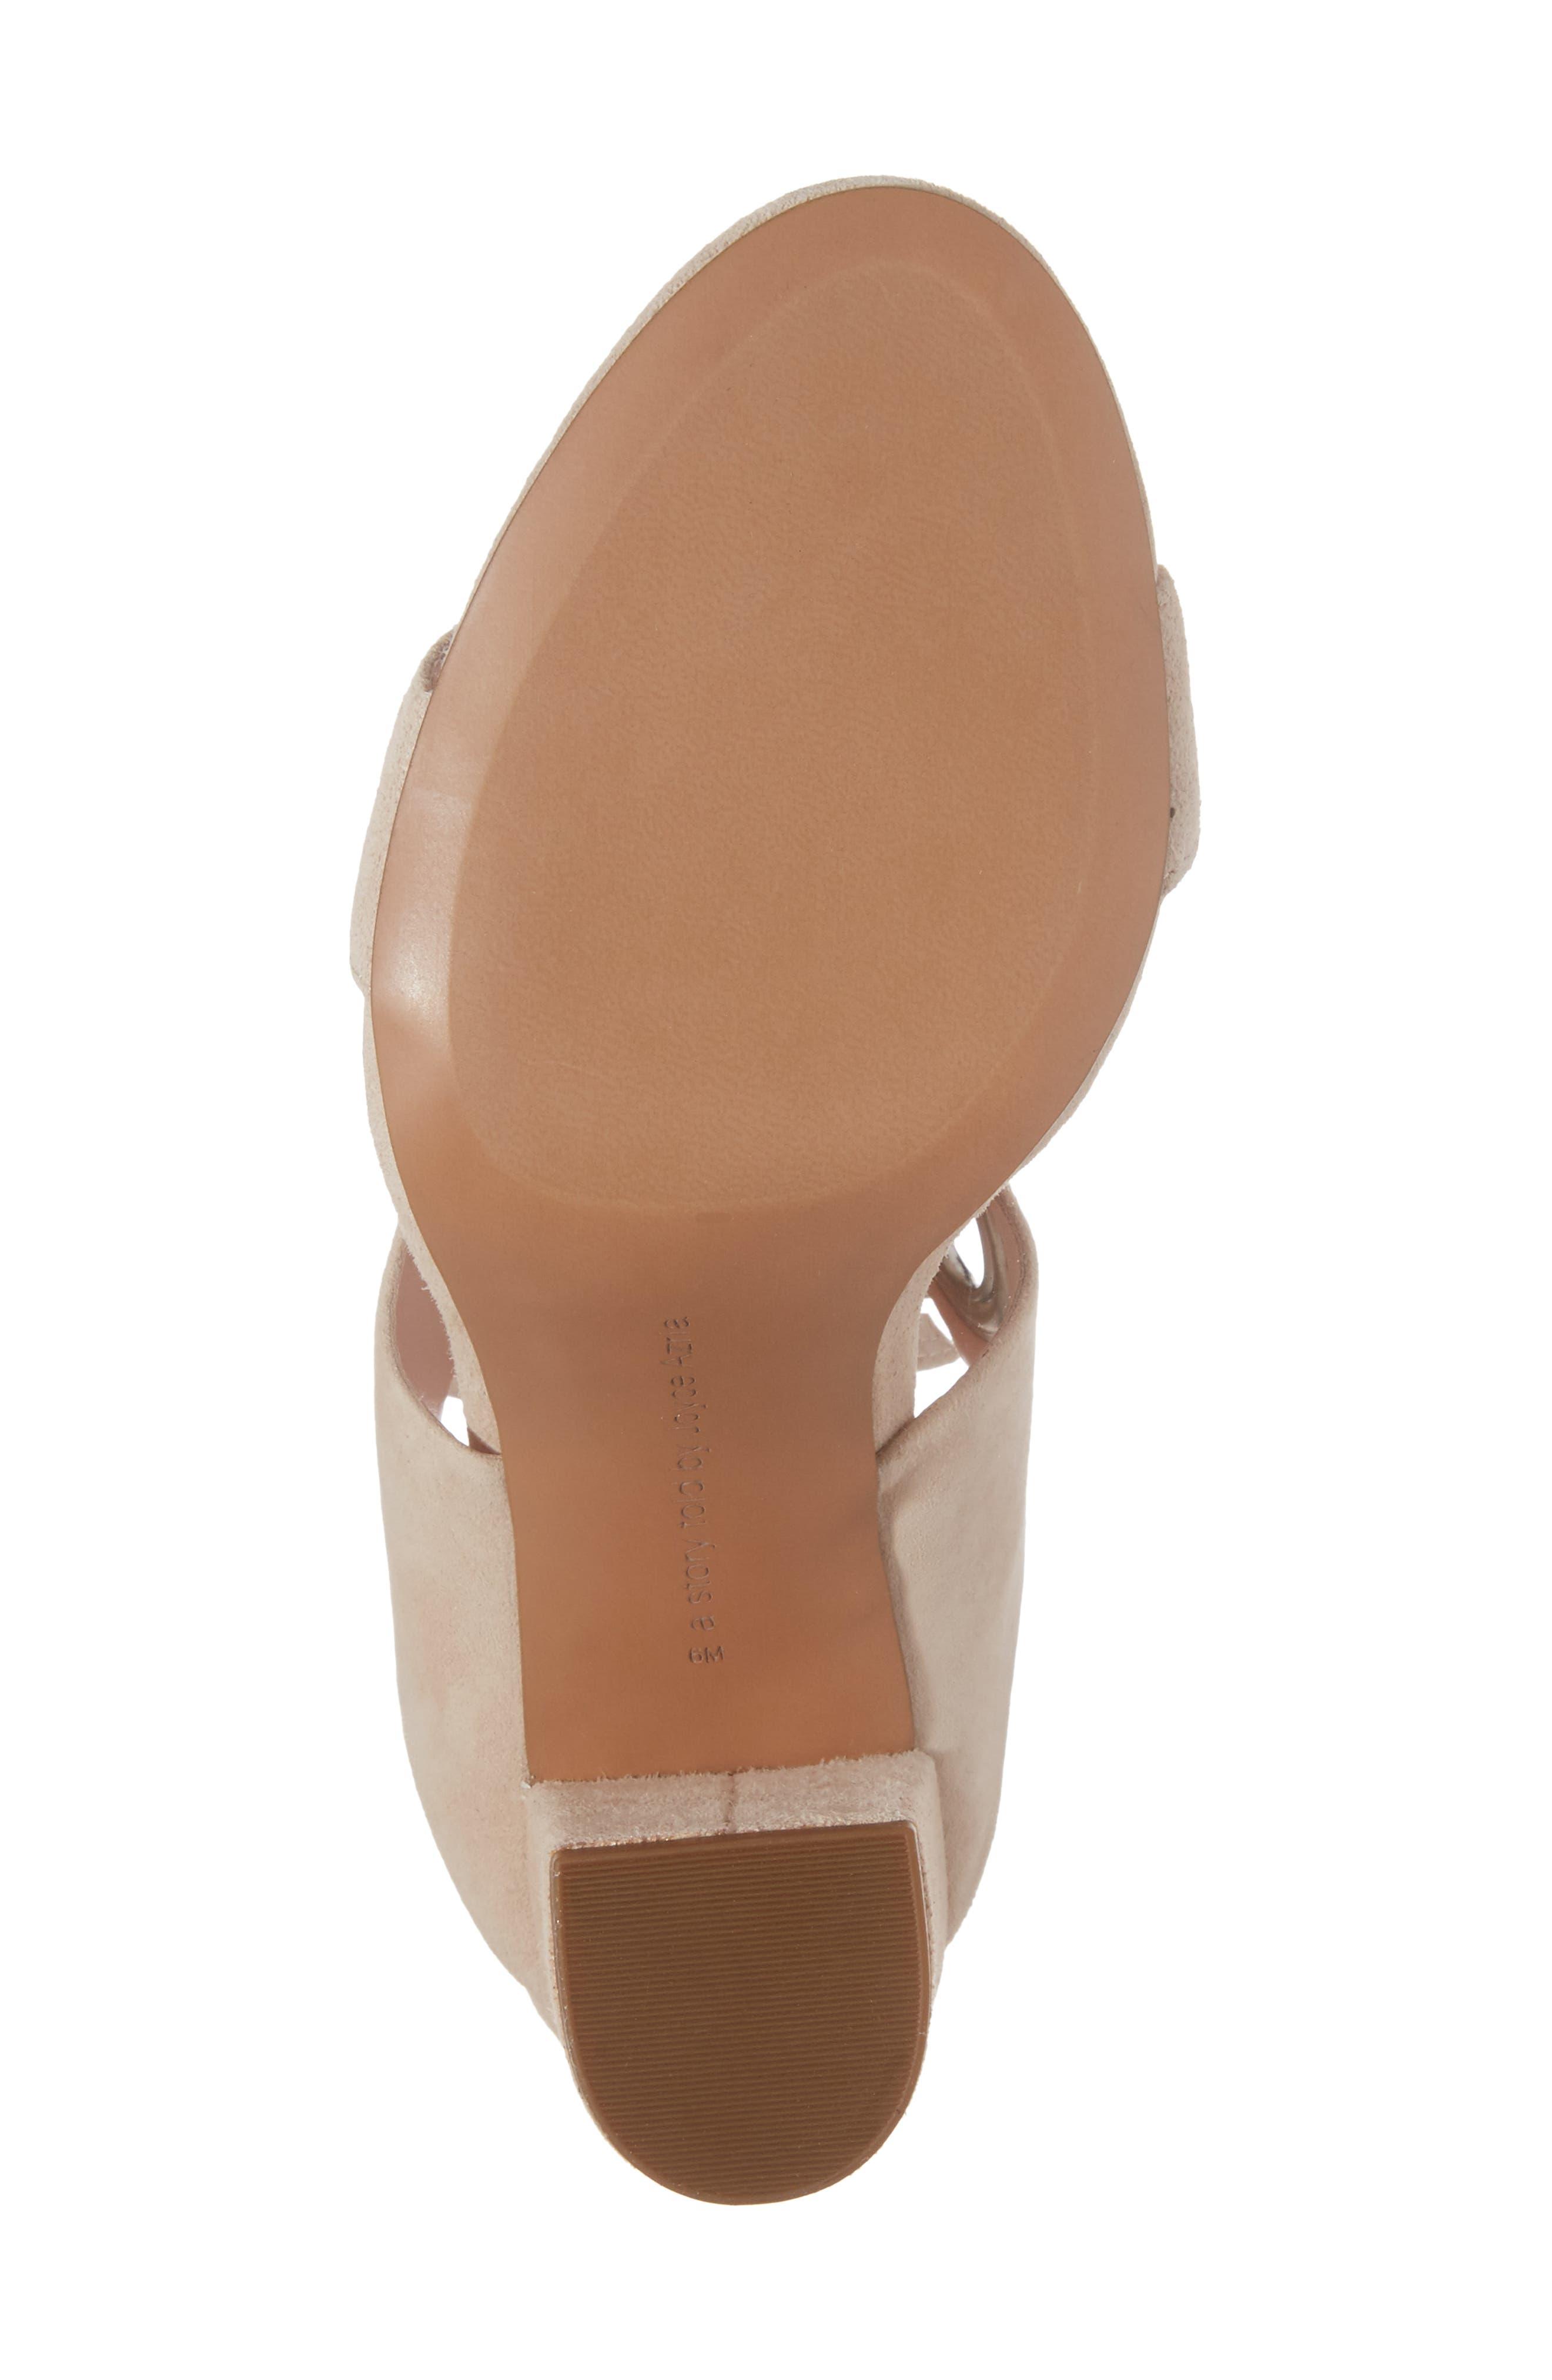 Megan Tie Strap Sandal,                             Alternate thumbnail 12, color,